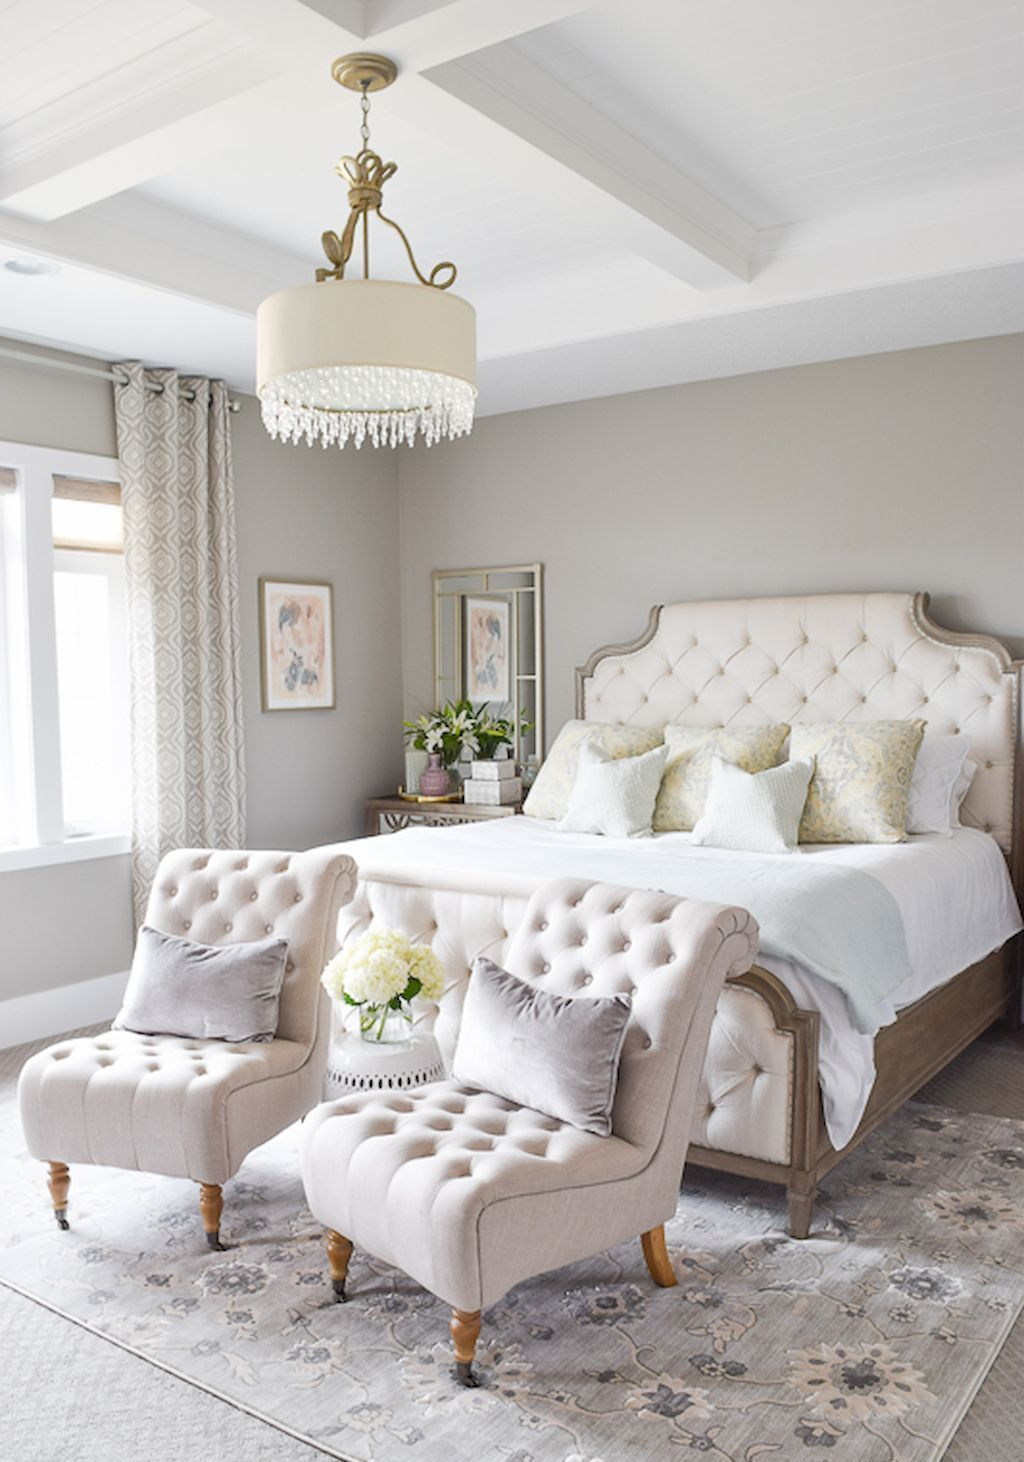 Cool 40 Inspiring Master Bedroom Makeover Ideas https://homeylife ...